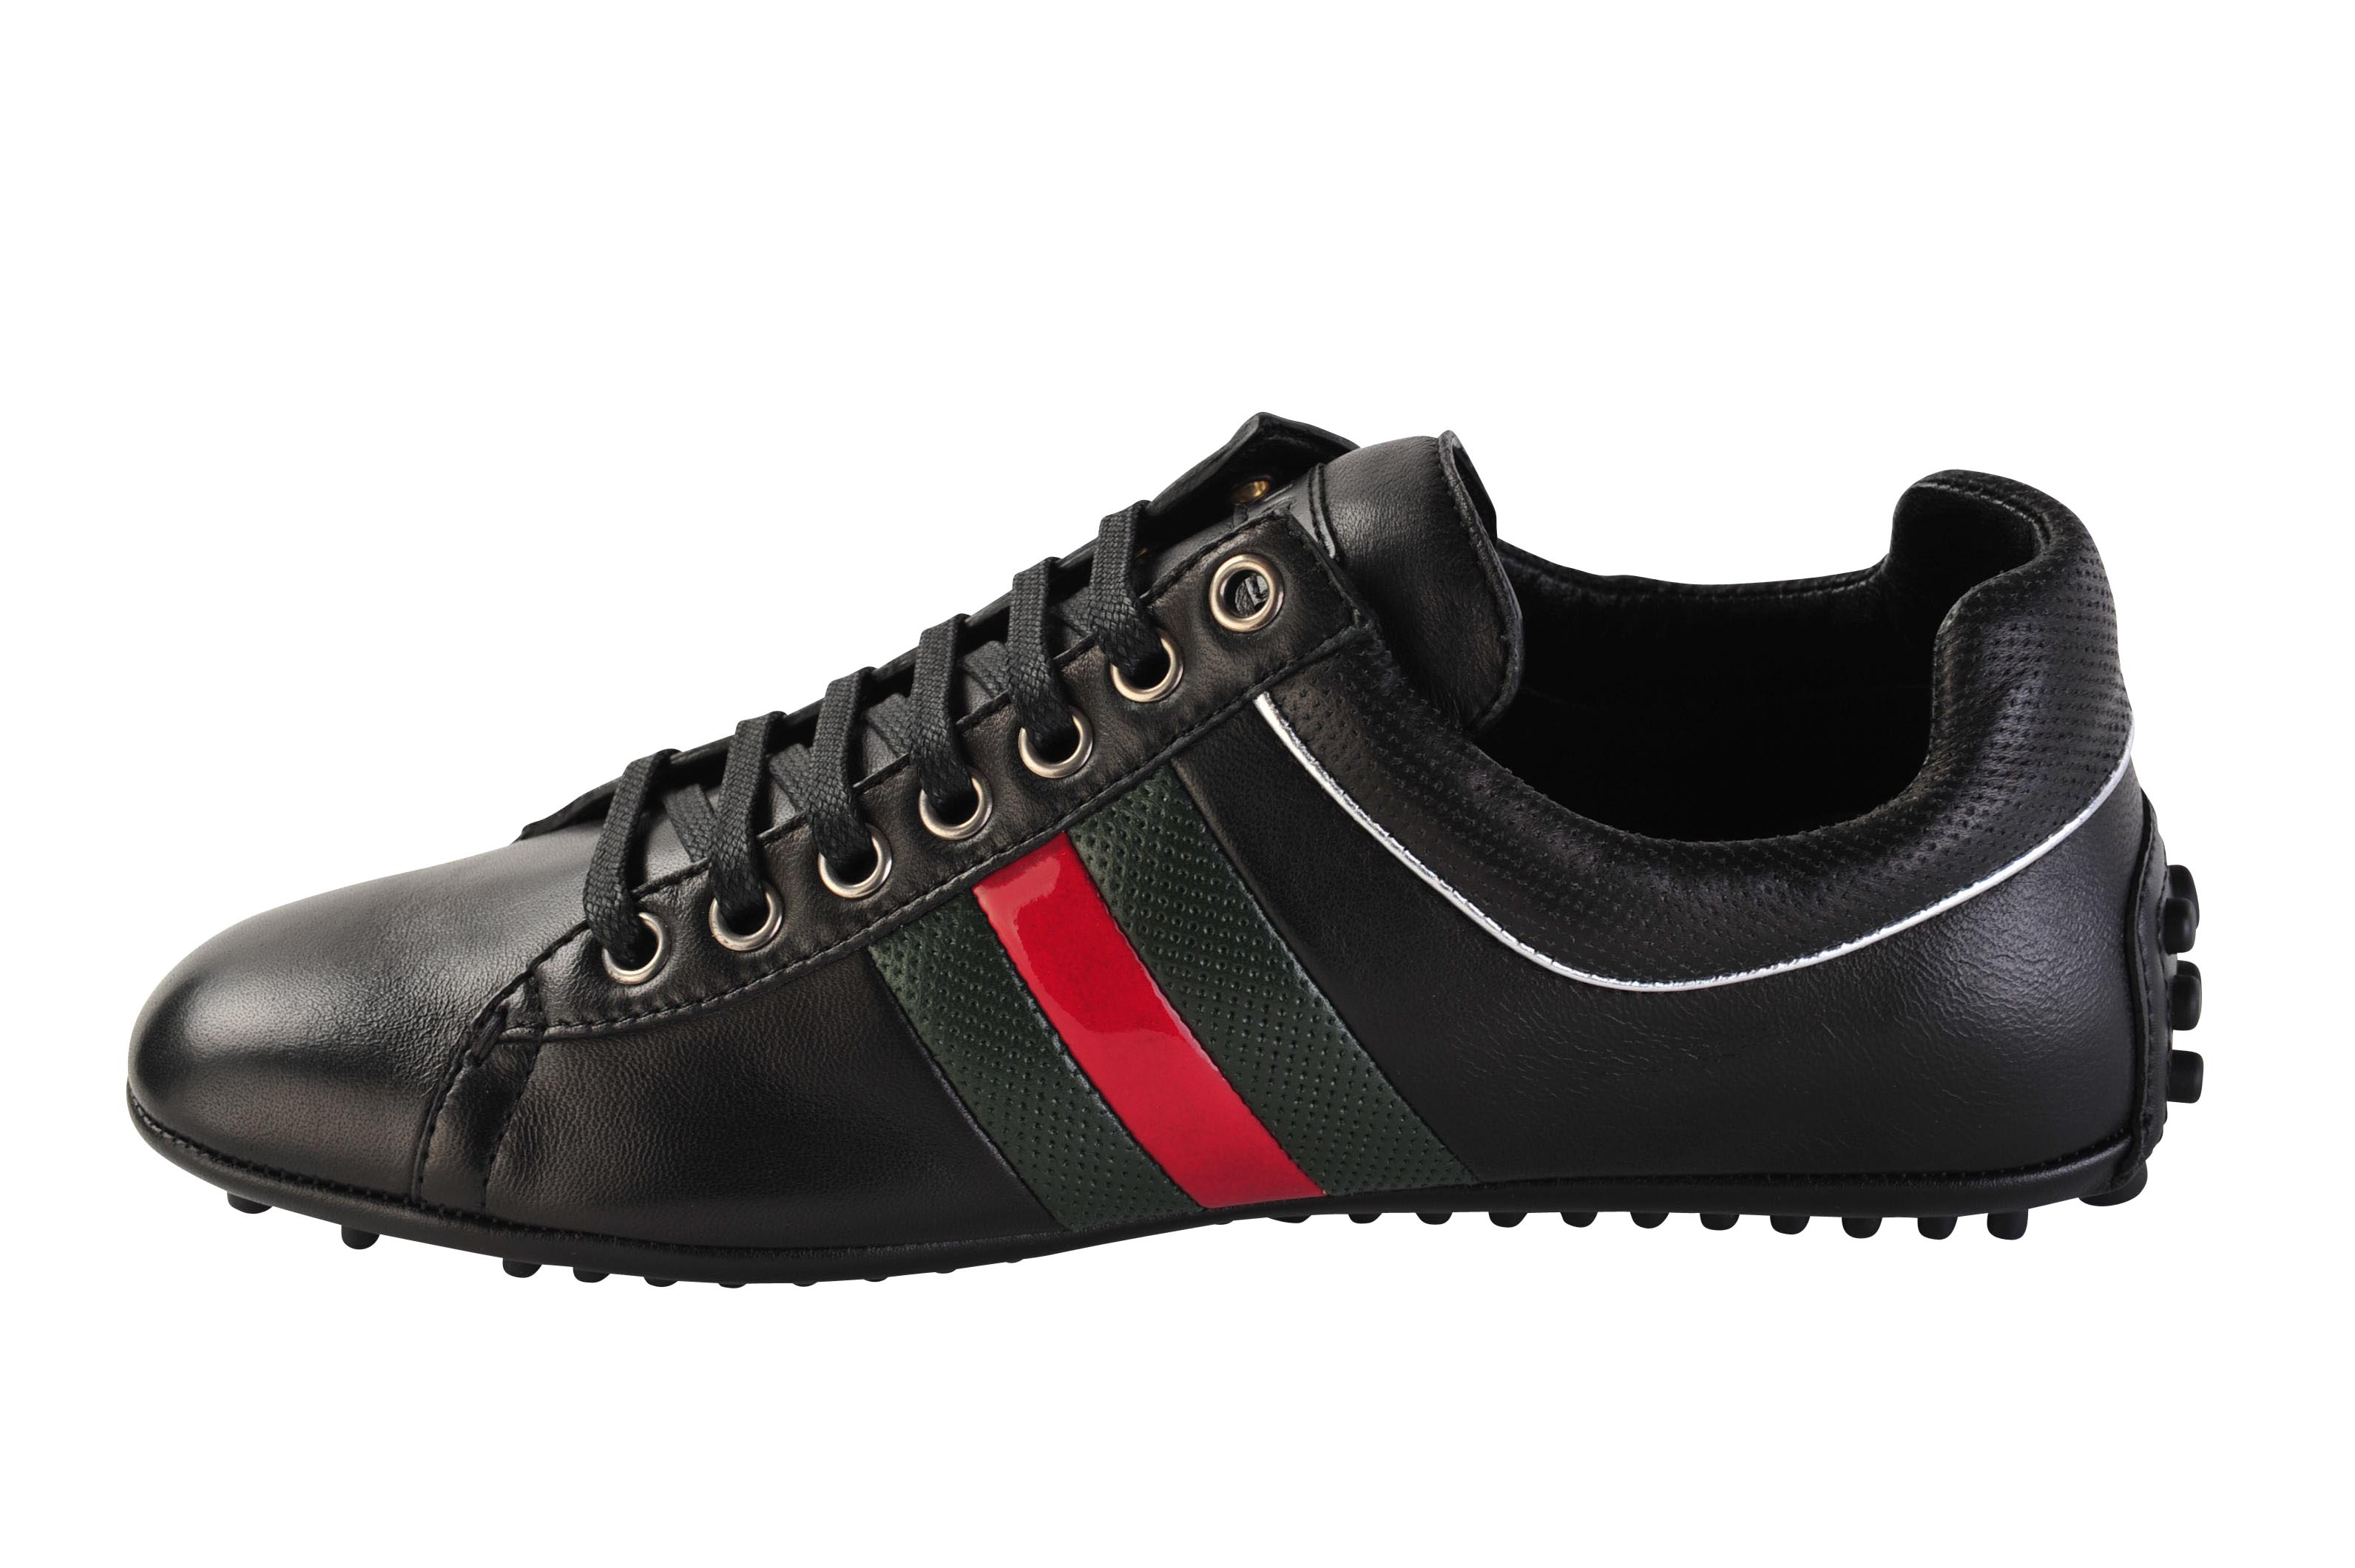 Gucci Online Shoe Store